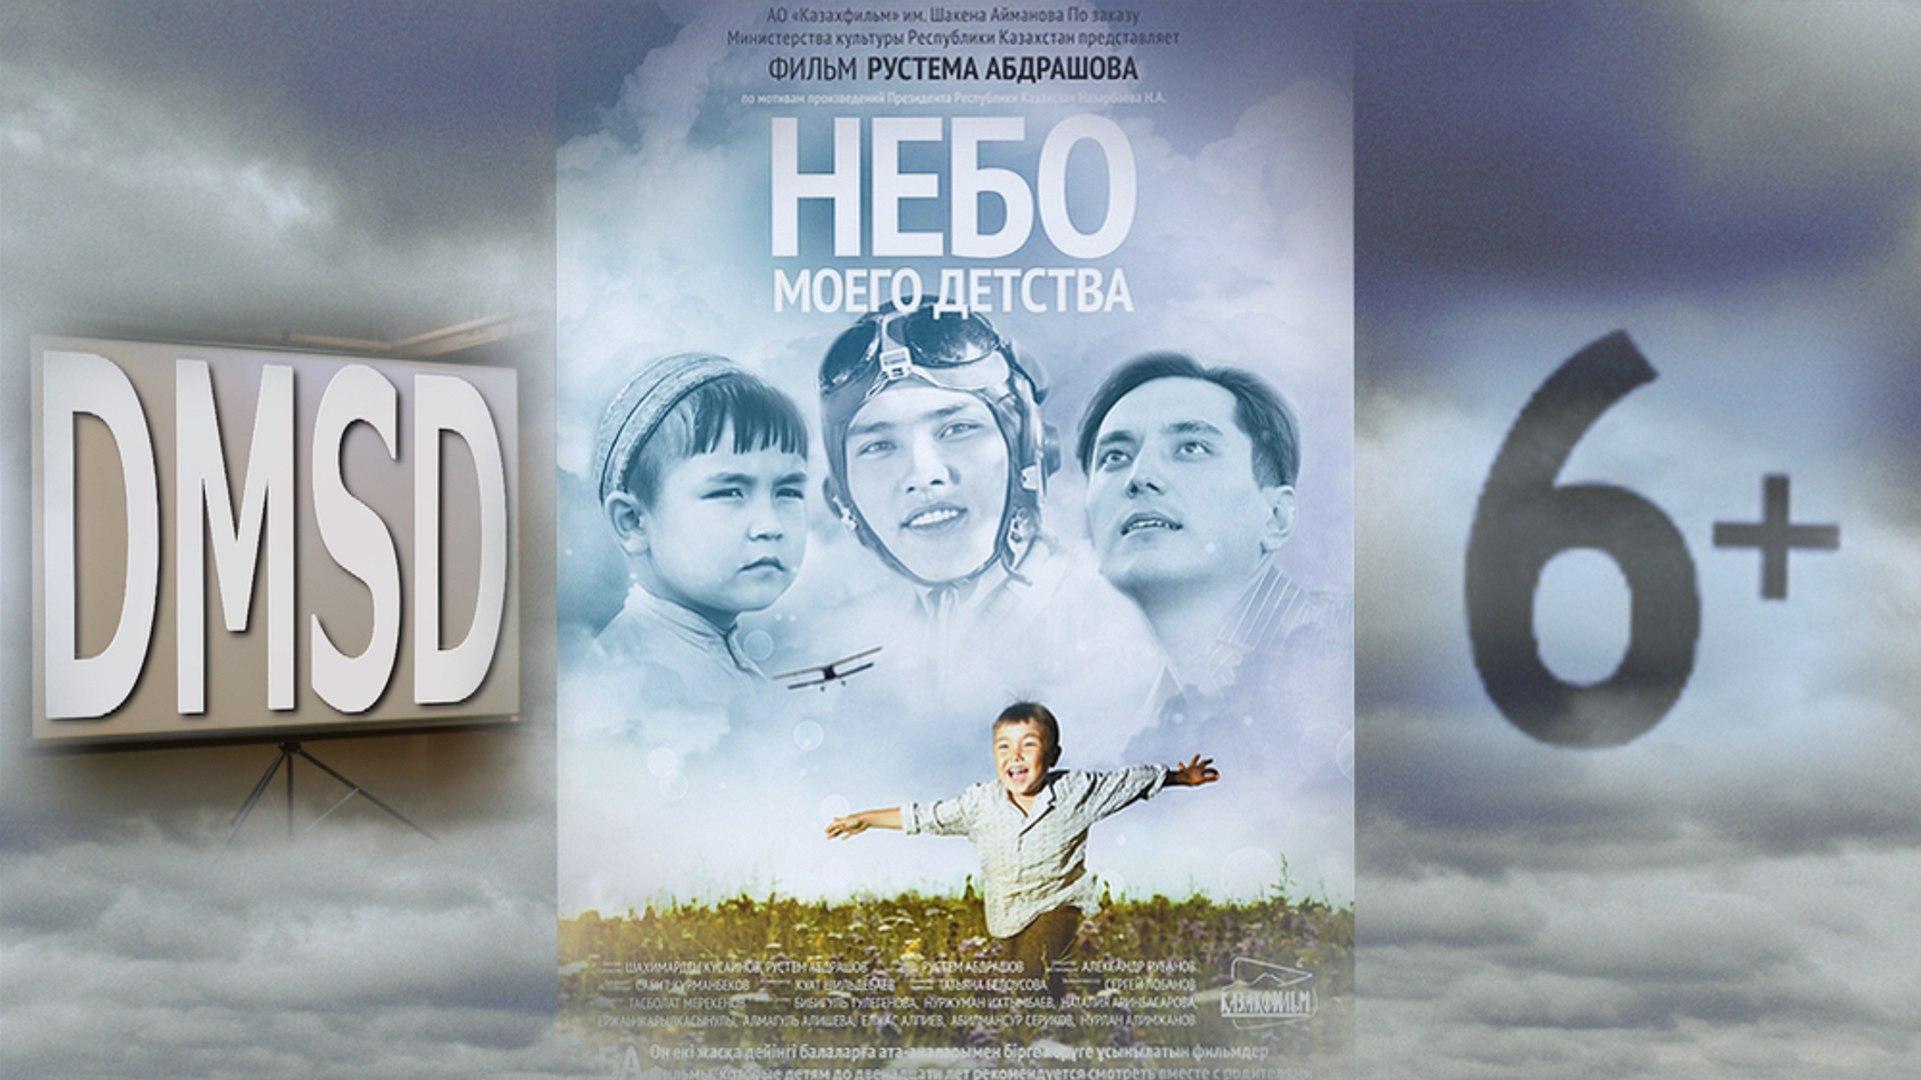 Nebo Moego Detstva, Kazakh Feature Film in Russian, Licensed Streaming Copy | Небо моего детства, фи